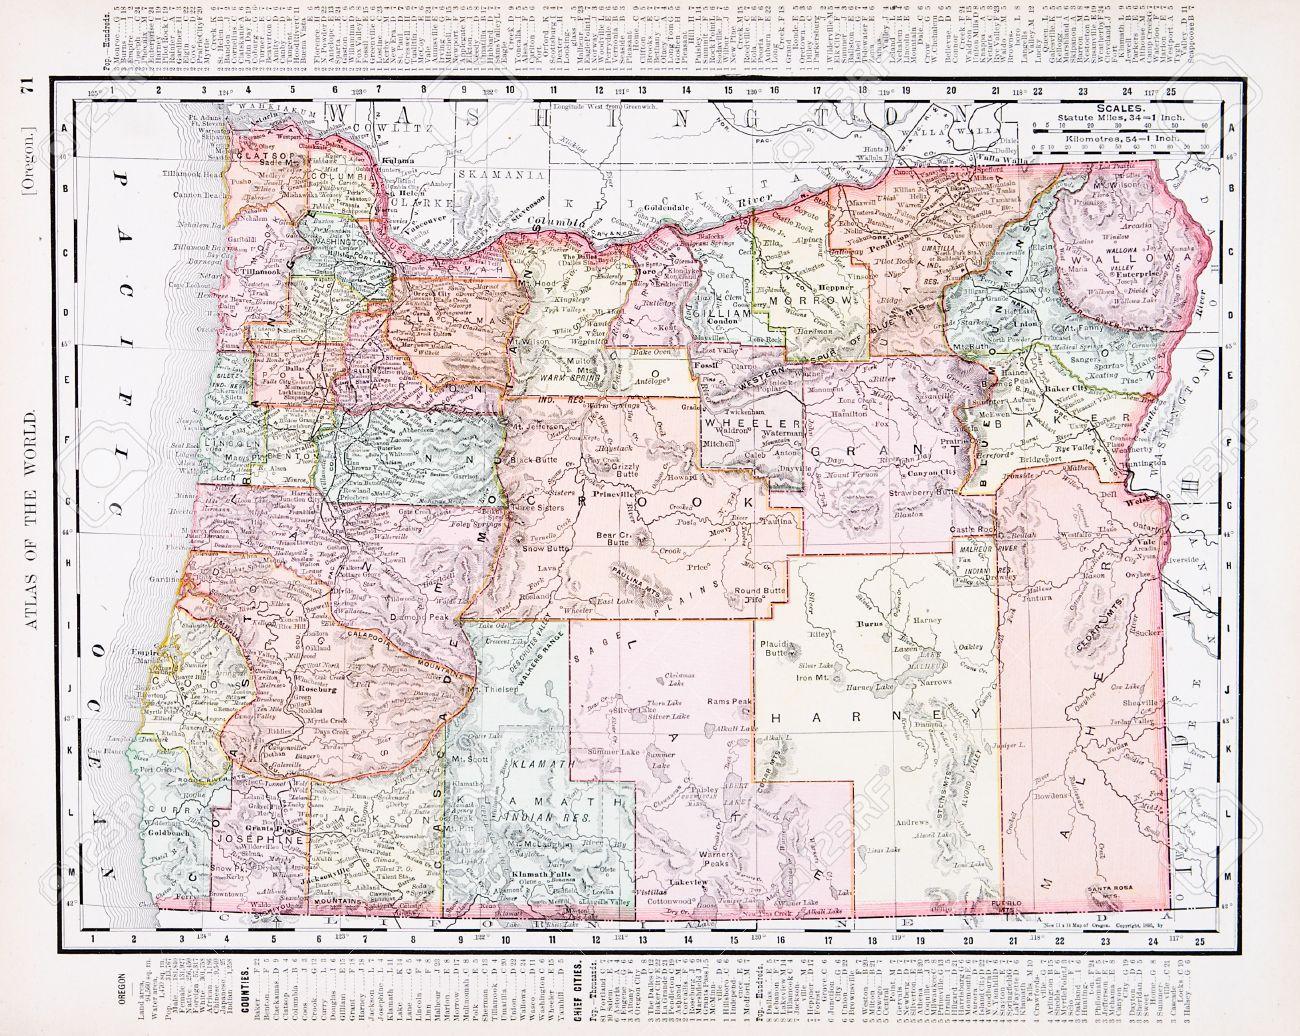 Vintage Oregon Map.Vintage Map Of The State Of Oregon United States 1900 Stock Photo